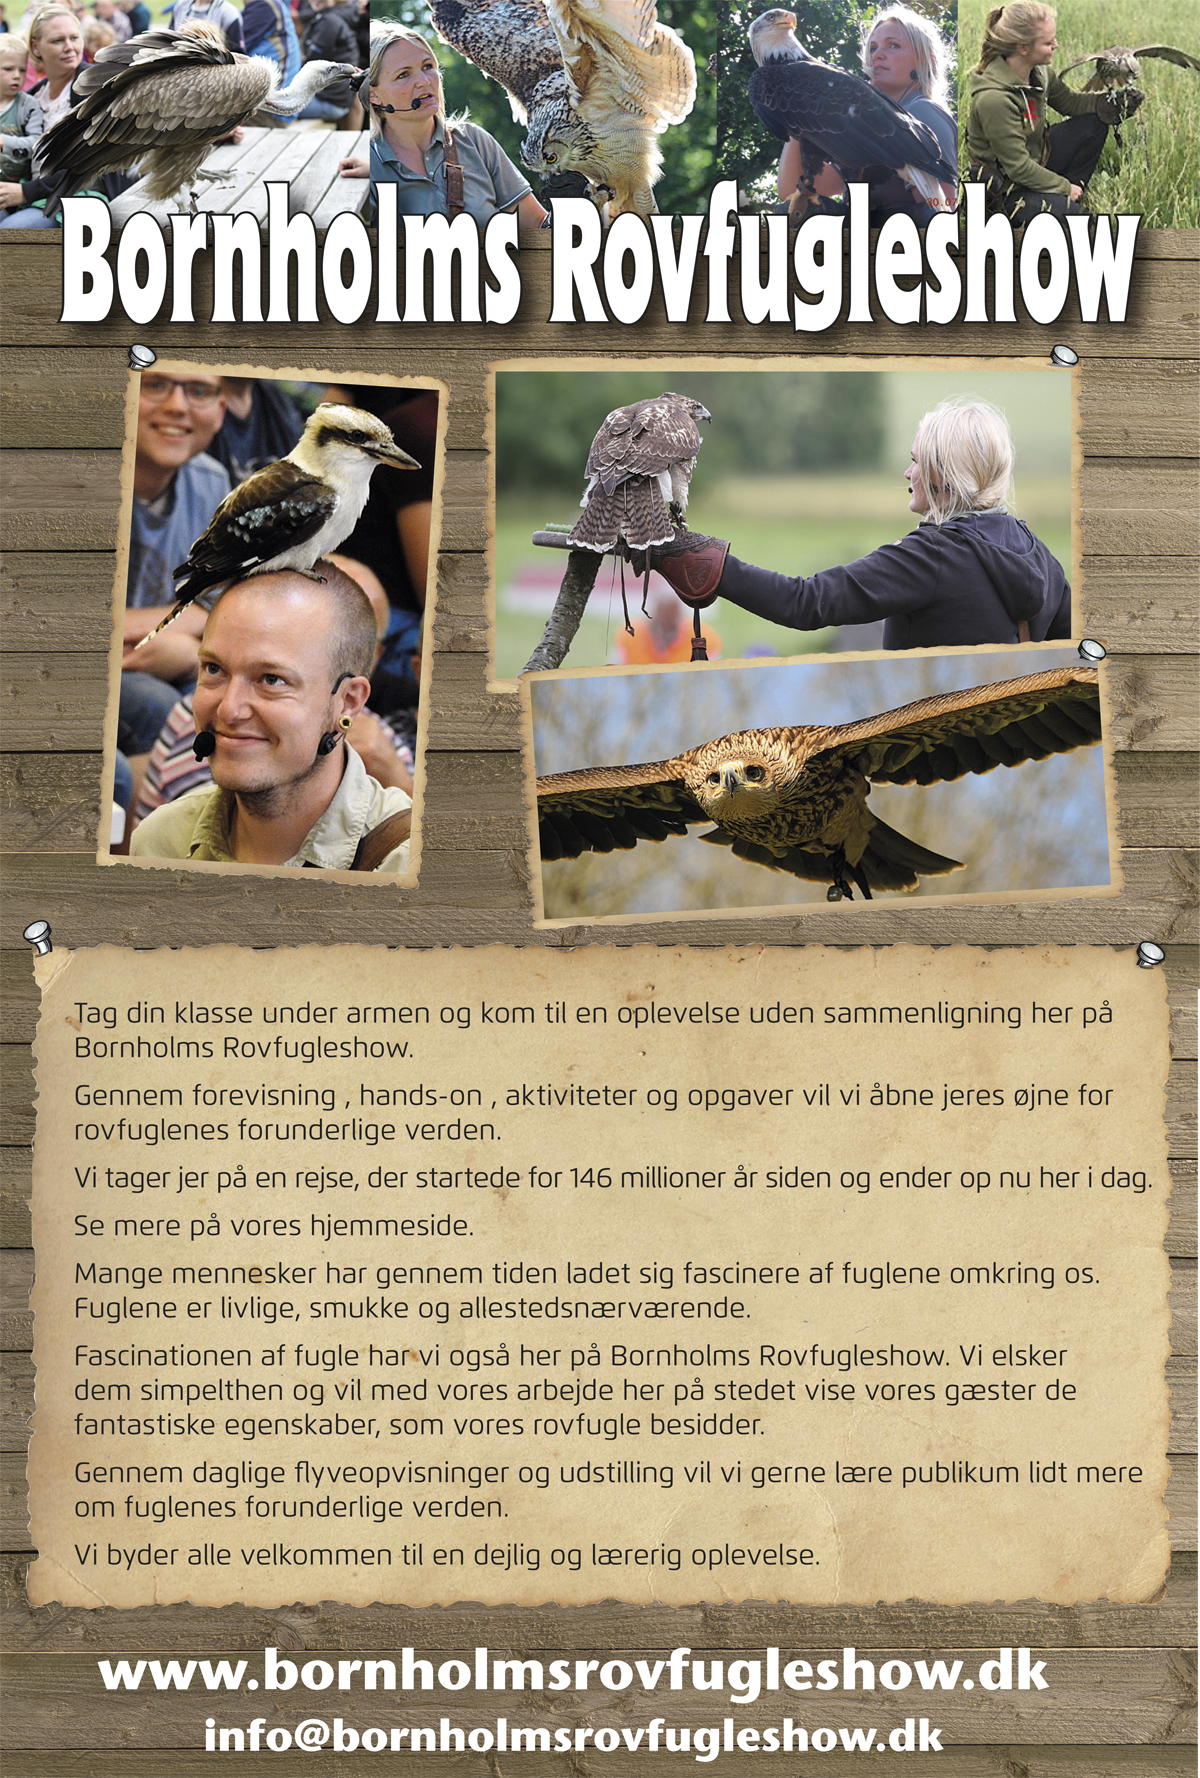 Bornholms-Rovfugleshow